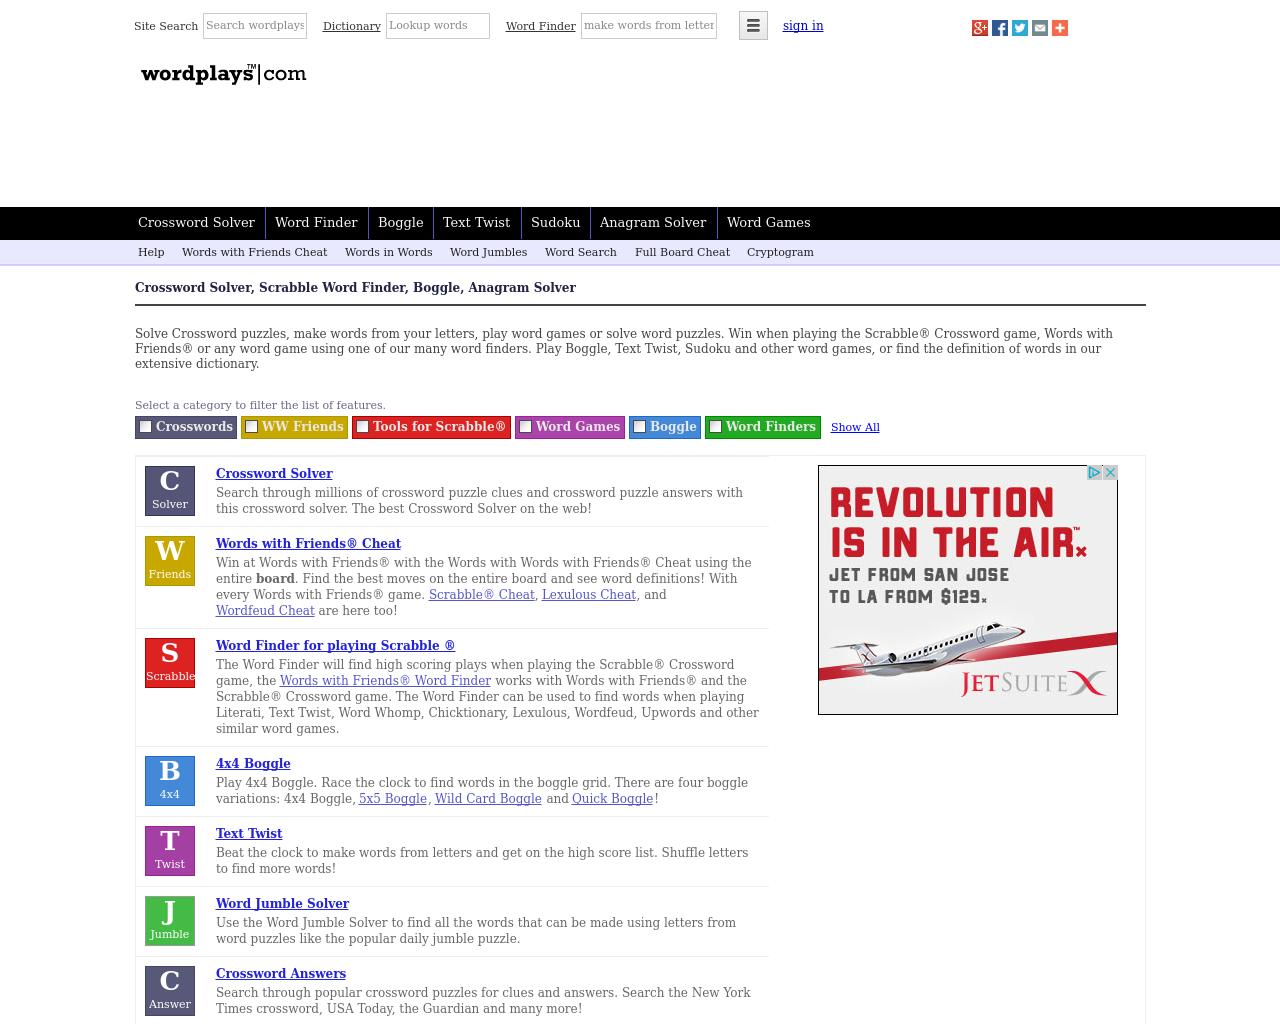 WordPlays.com-Advertising-Reviews-Pricing